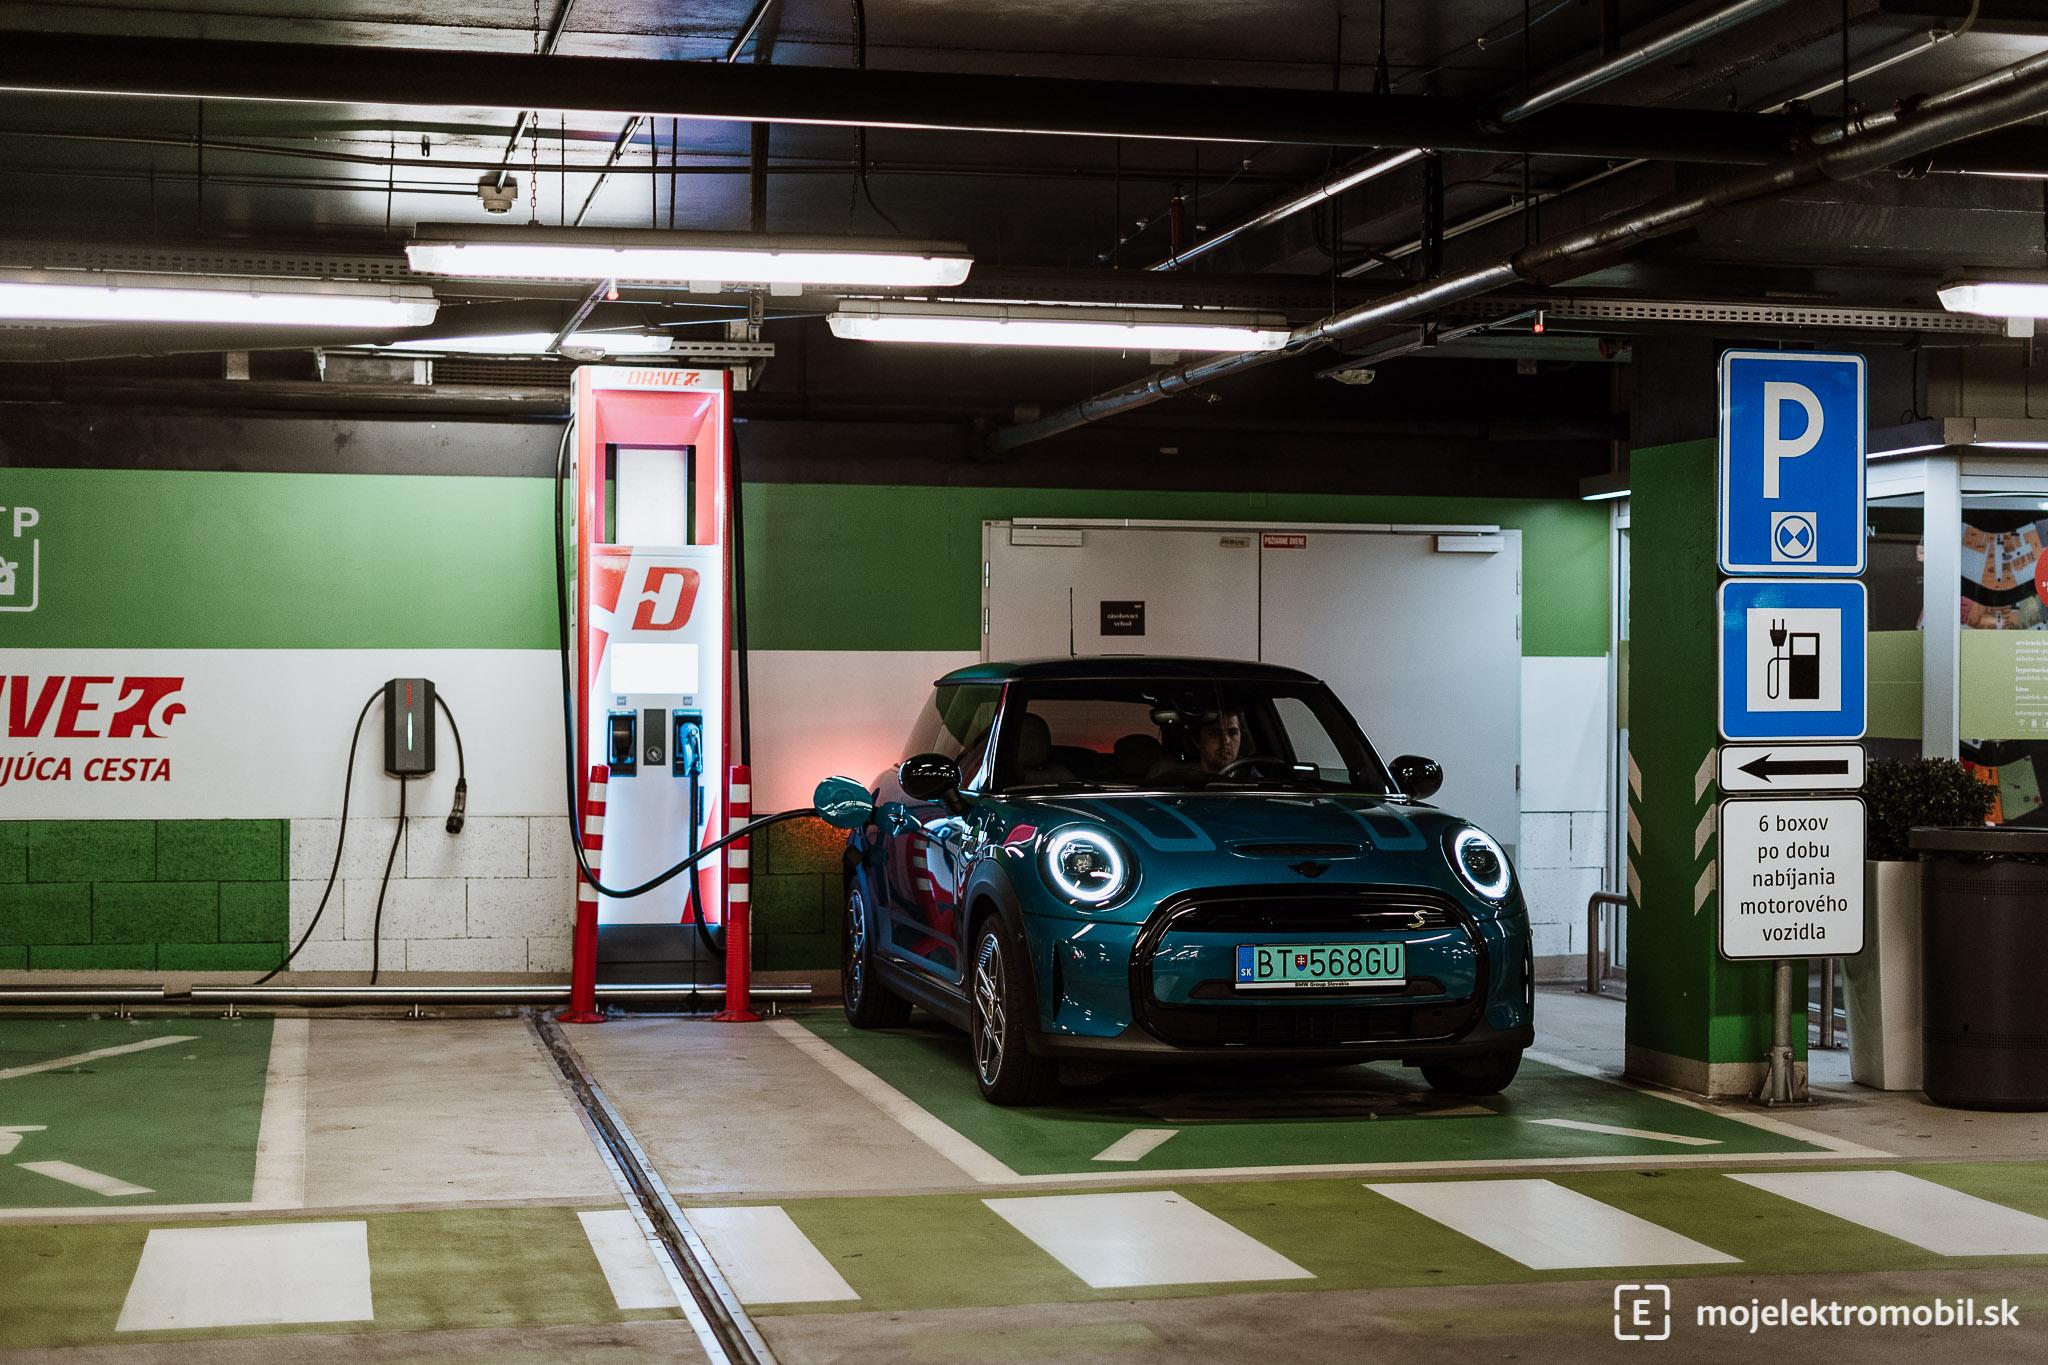 Mini Cooper SE ZSE Drive nabíjacia stanica